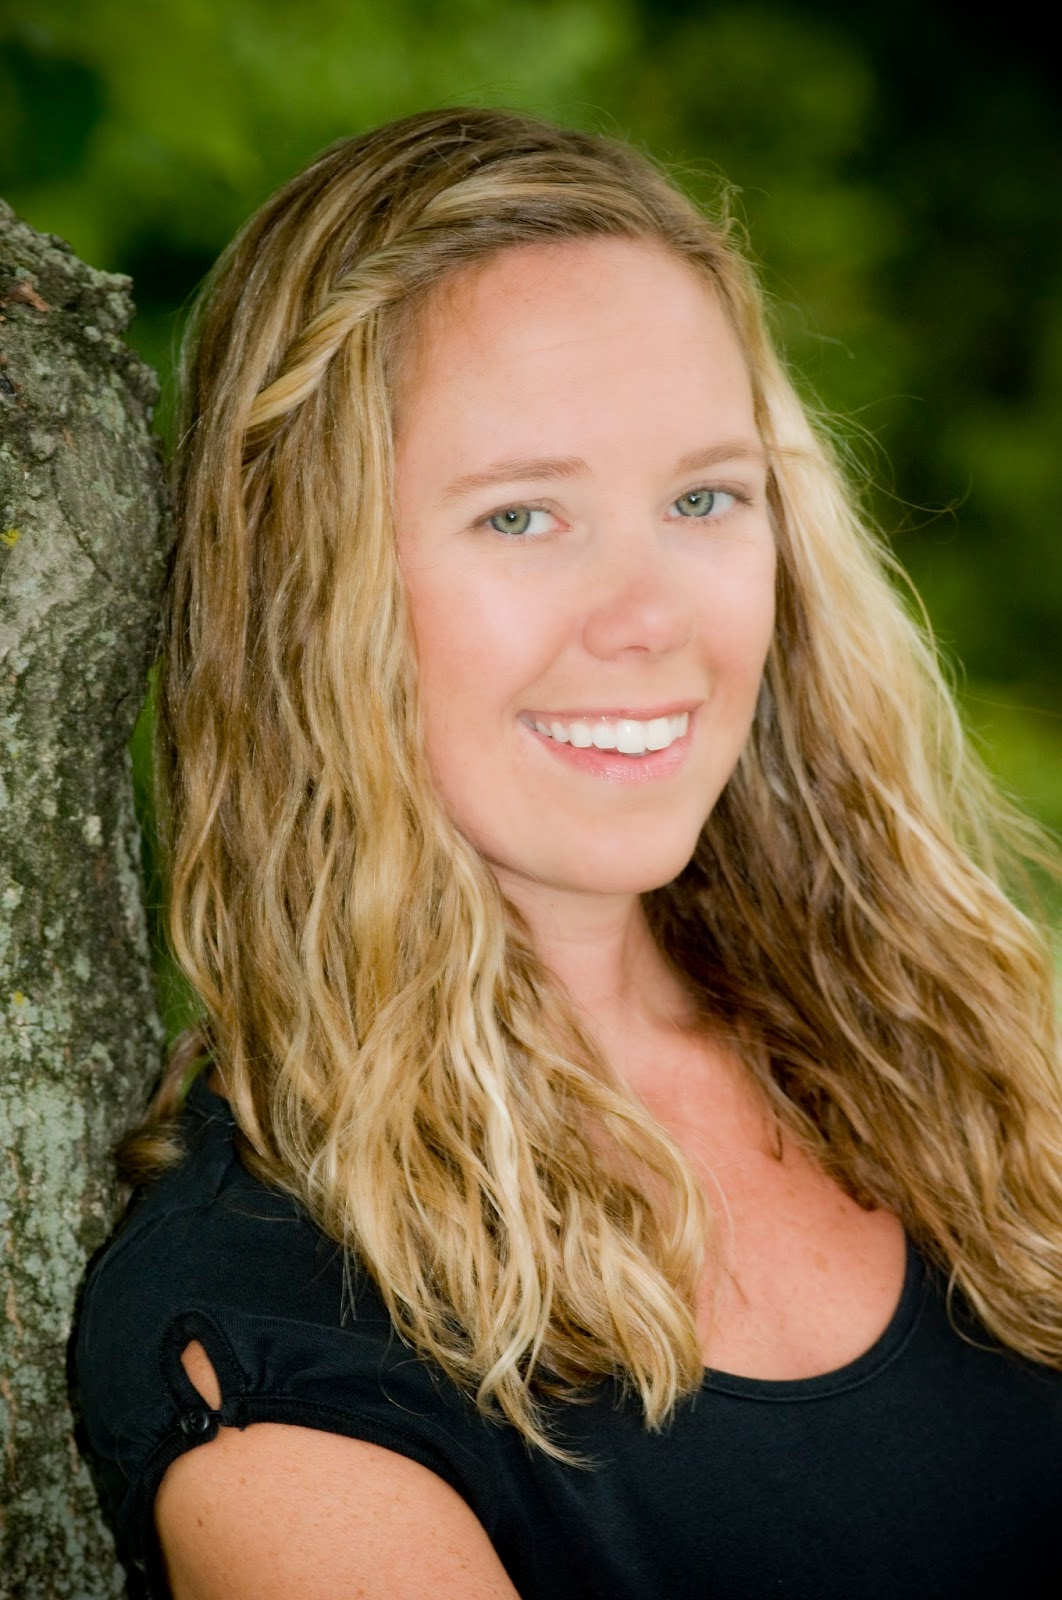 OAAA Interview: Kristina McBride